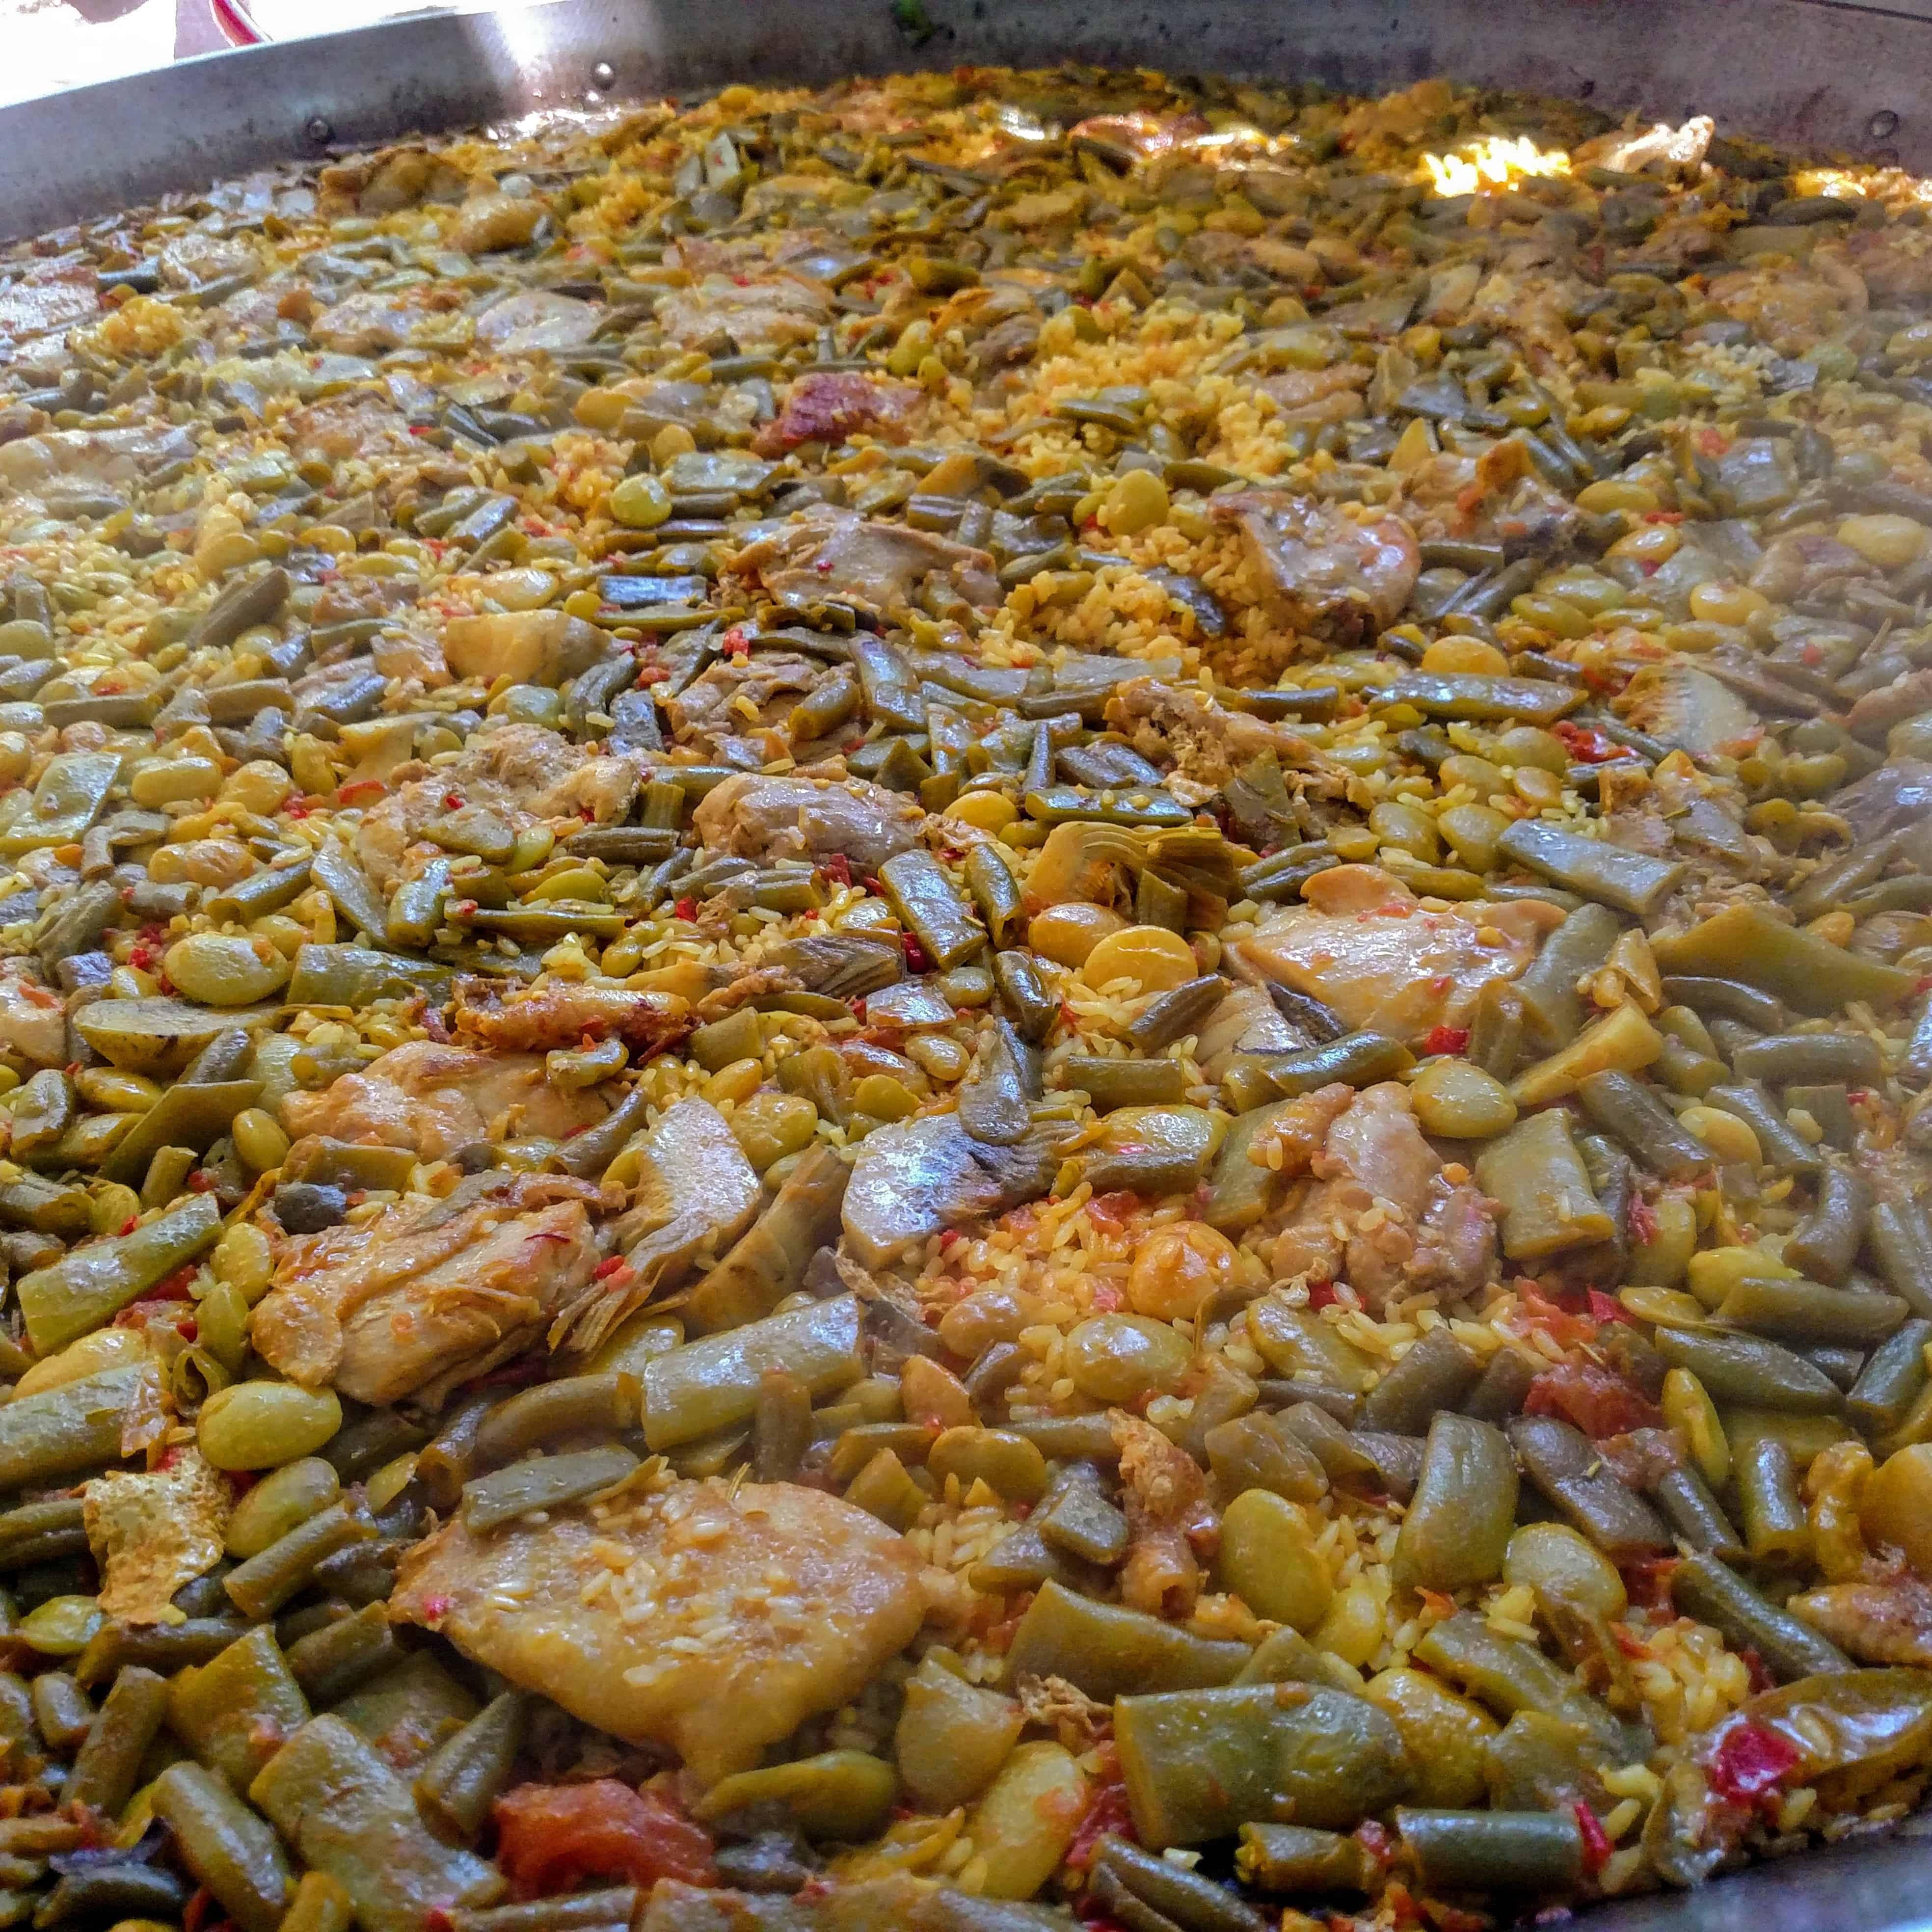 Organic Paella Catering in Tallahassee, Florida